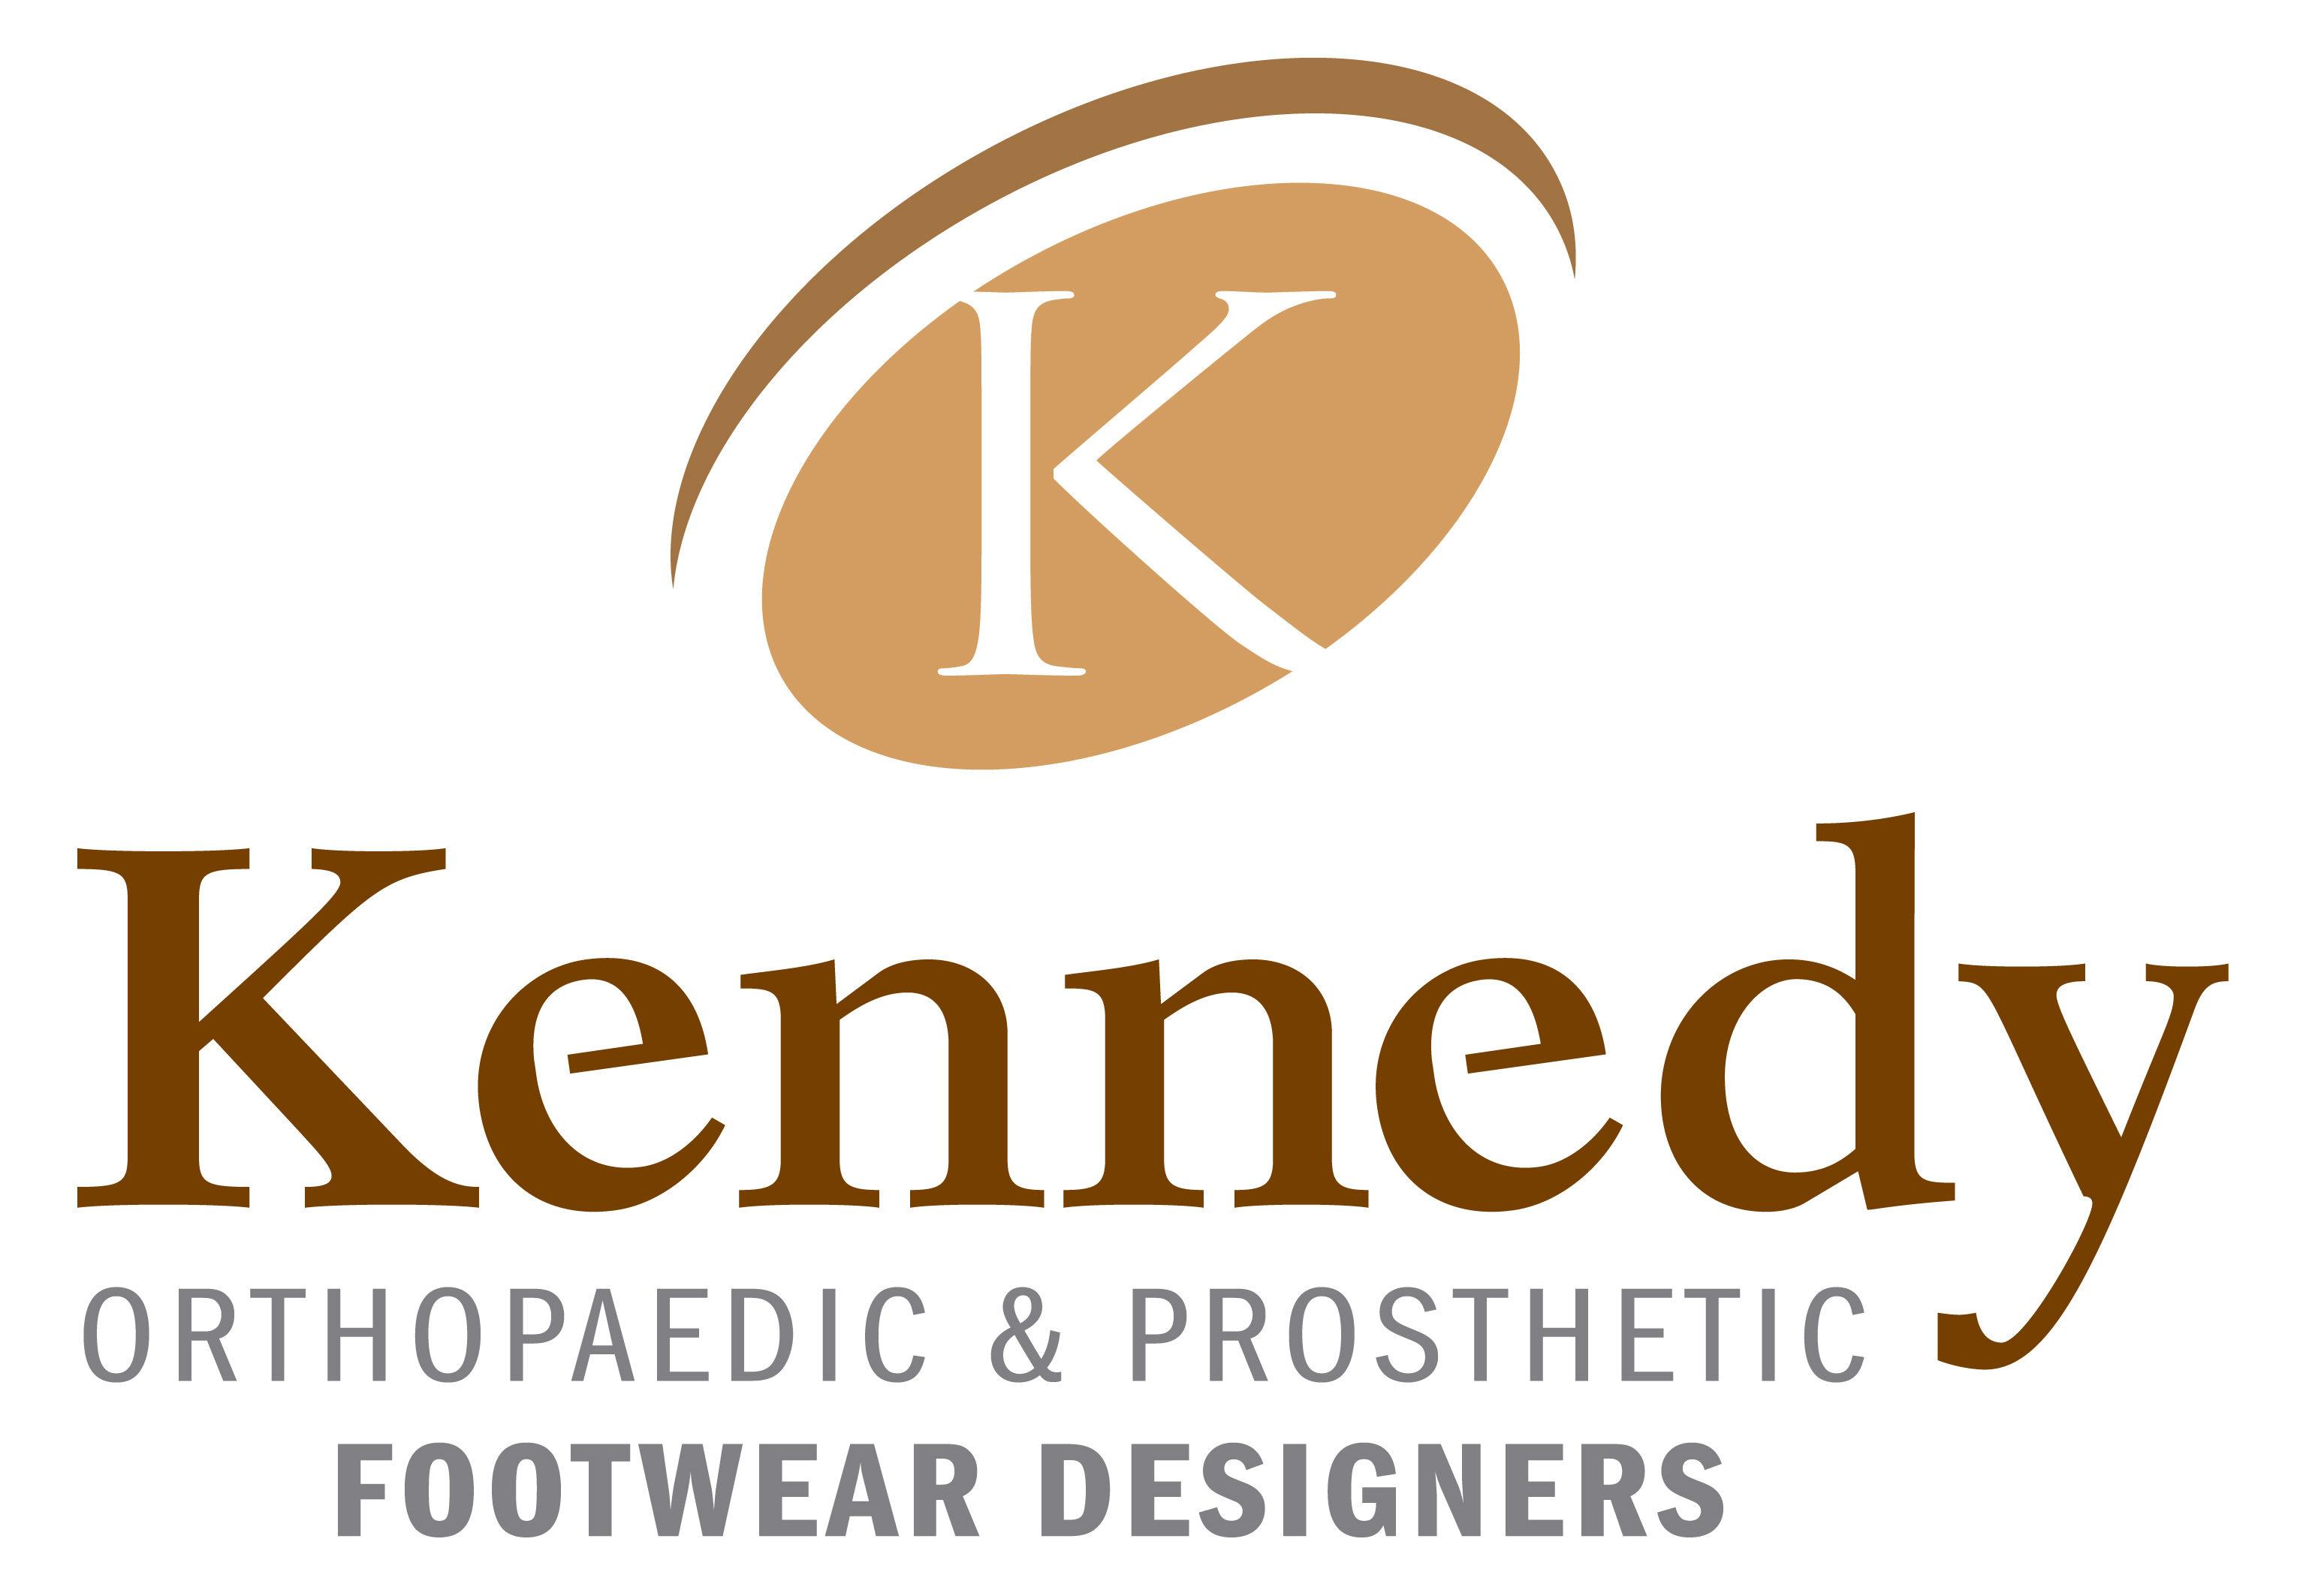 Kennedy & Associates